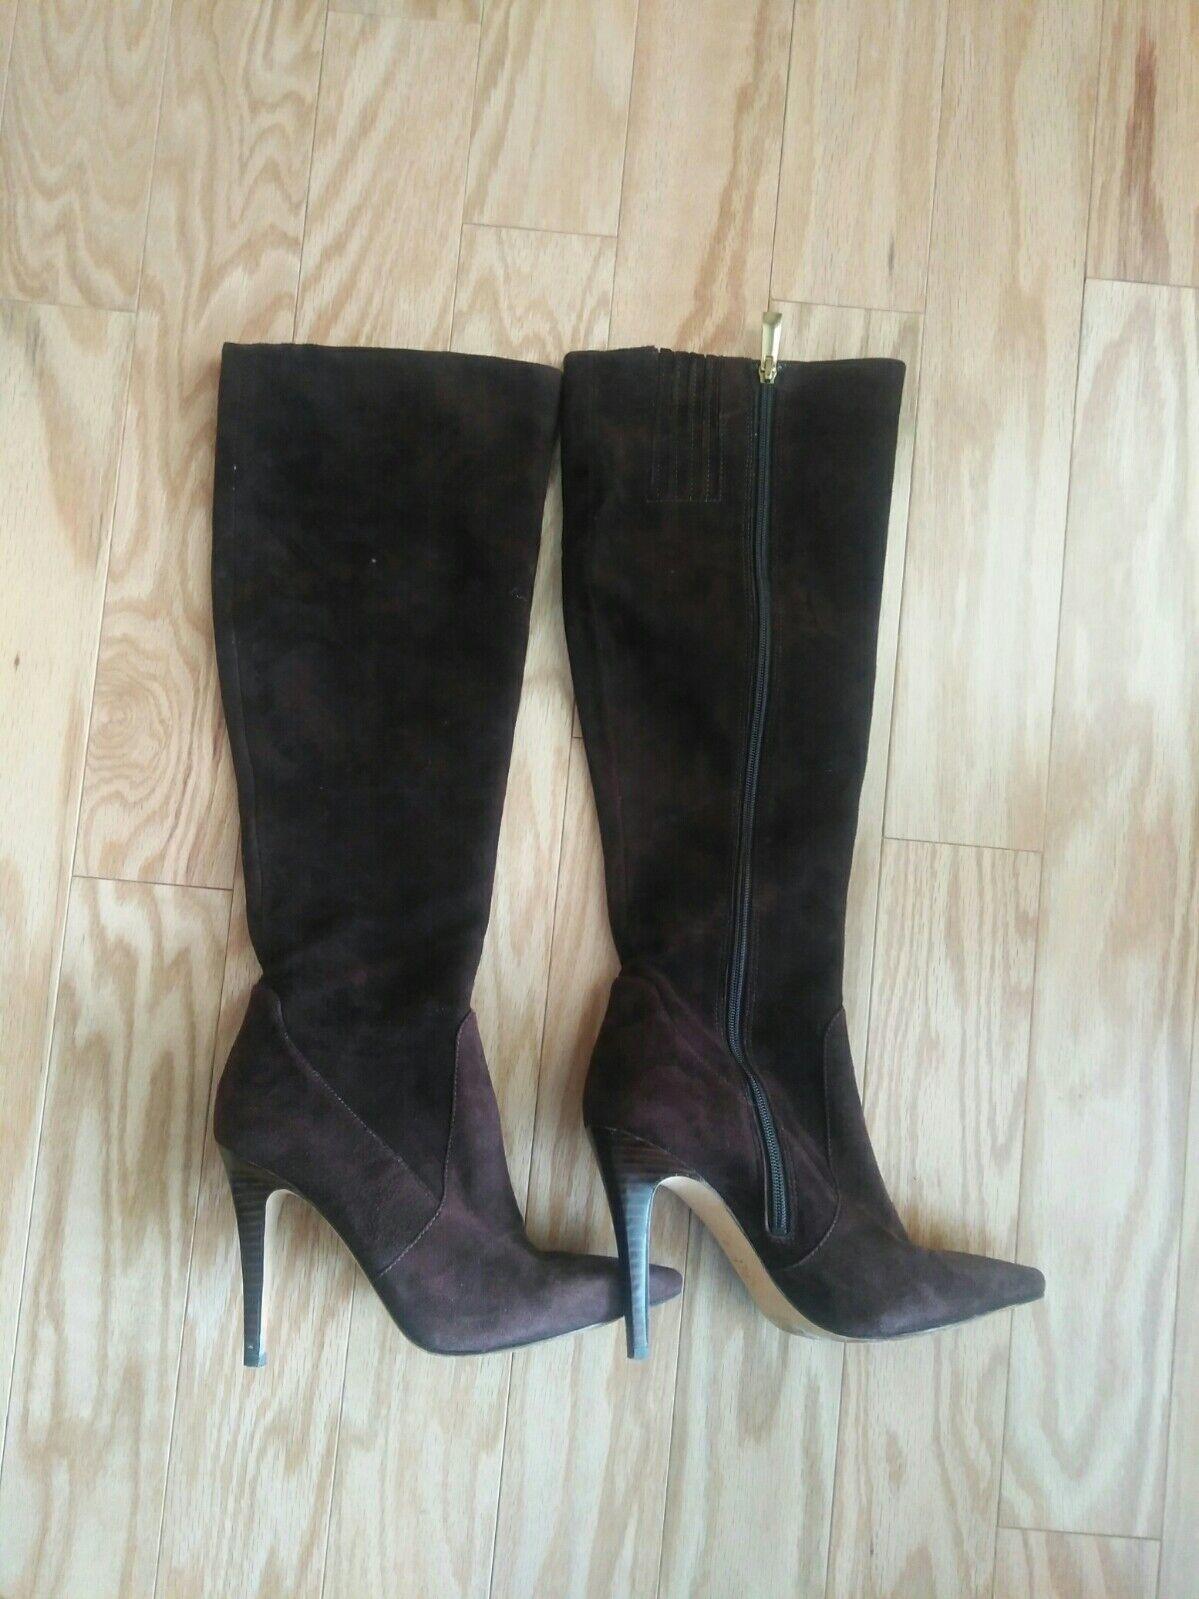 VIA VIA VIA SPIGA brown Suede leather knee high boots  SIZE 4 M   499 7c0ee3